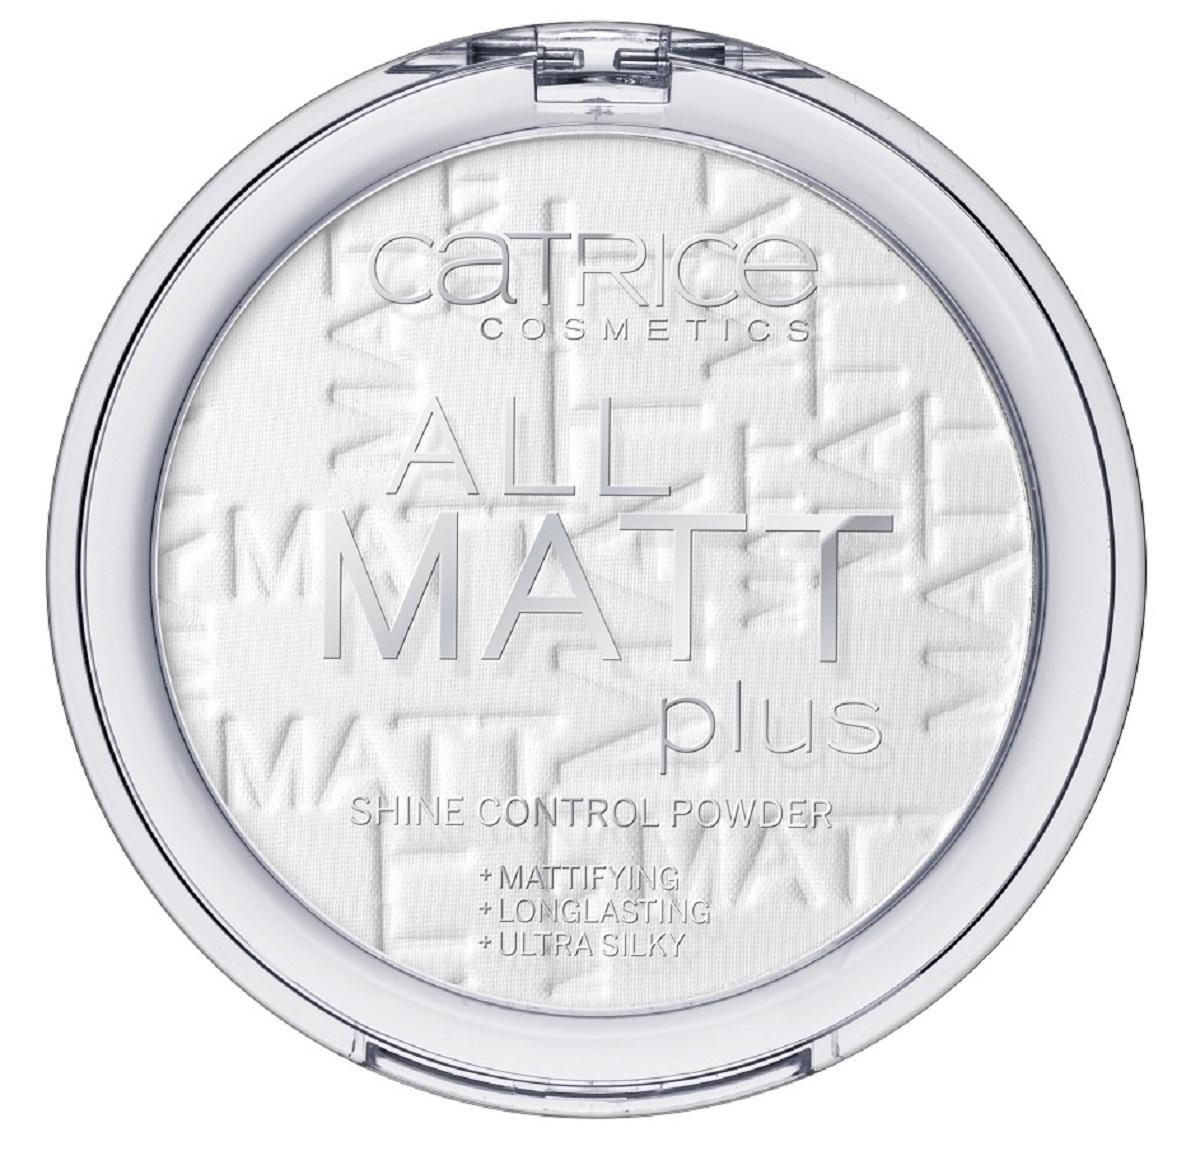 CatriceПудра компактная All Matt Plus Shine Control Powder 001, цвет: прозрачный компактная пудра isa dora anti shine матирующая тон 31 цвет матовый бежевый 10 г